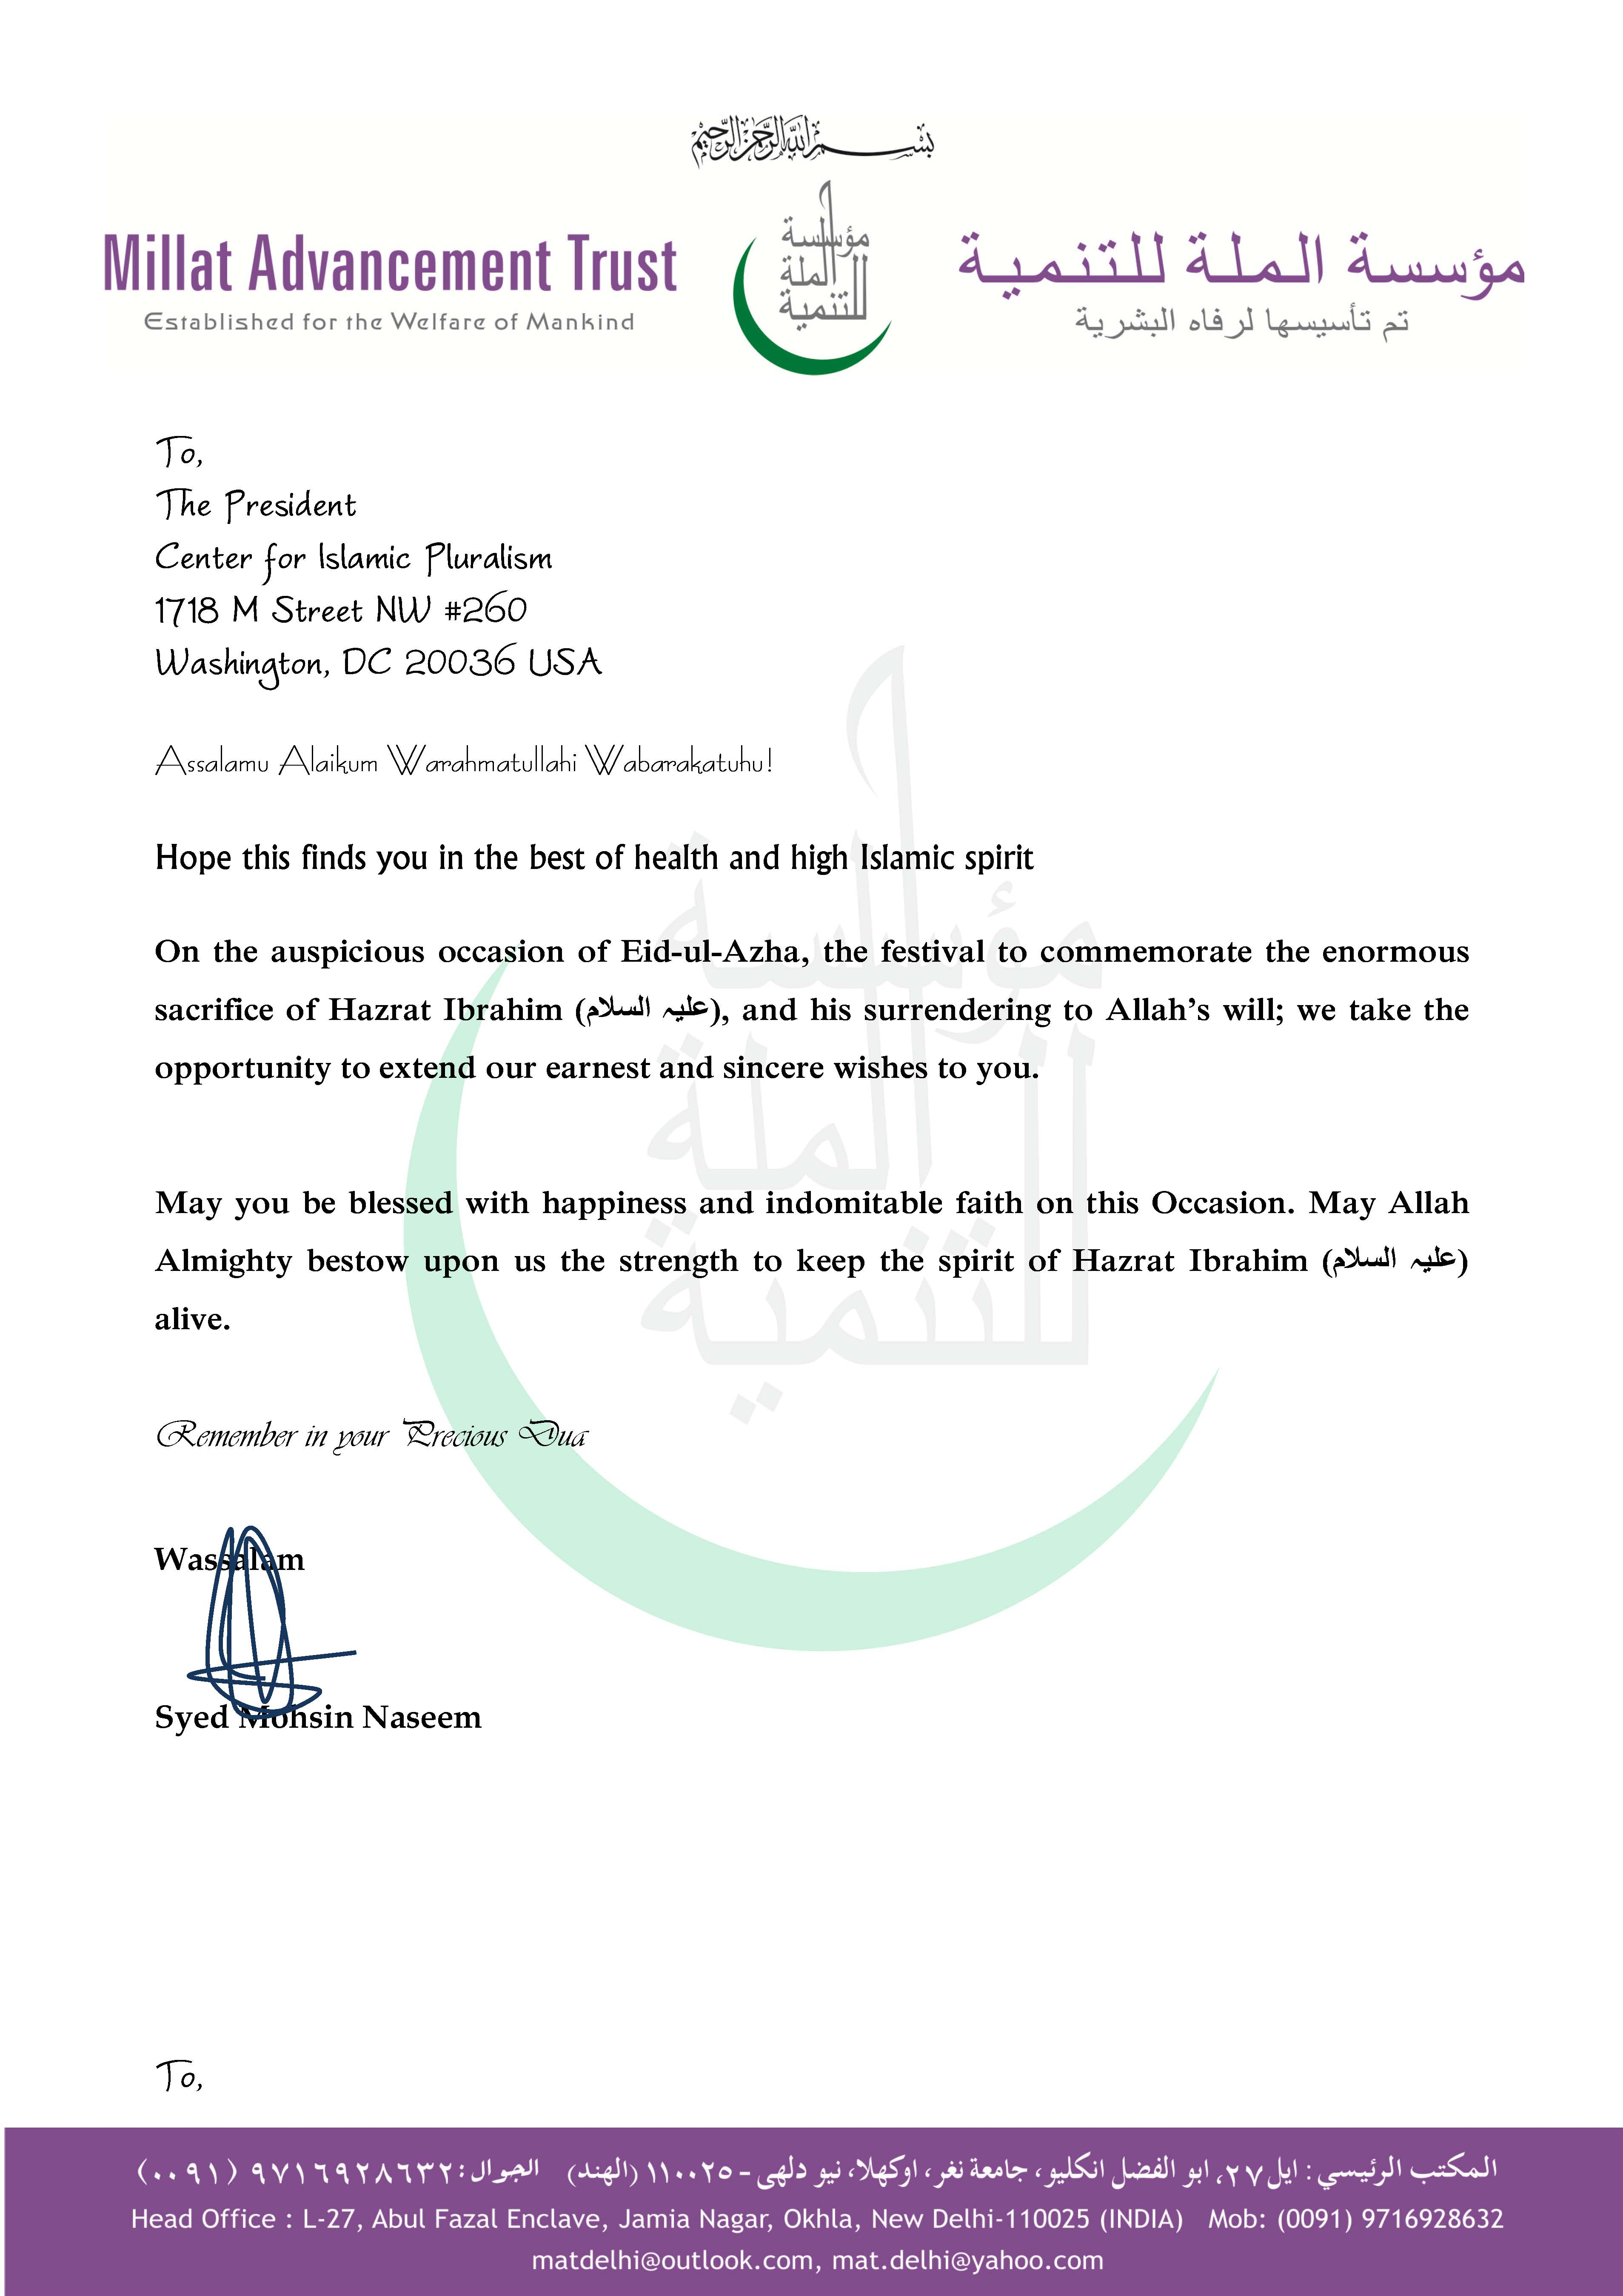 Eid Al Azha Greetings From Millat Advancement Trust Of India To Cip